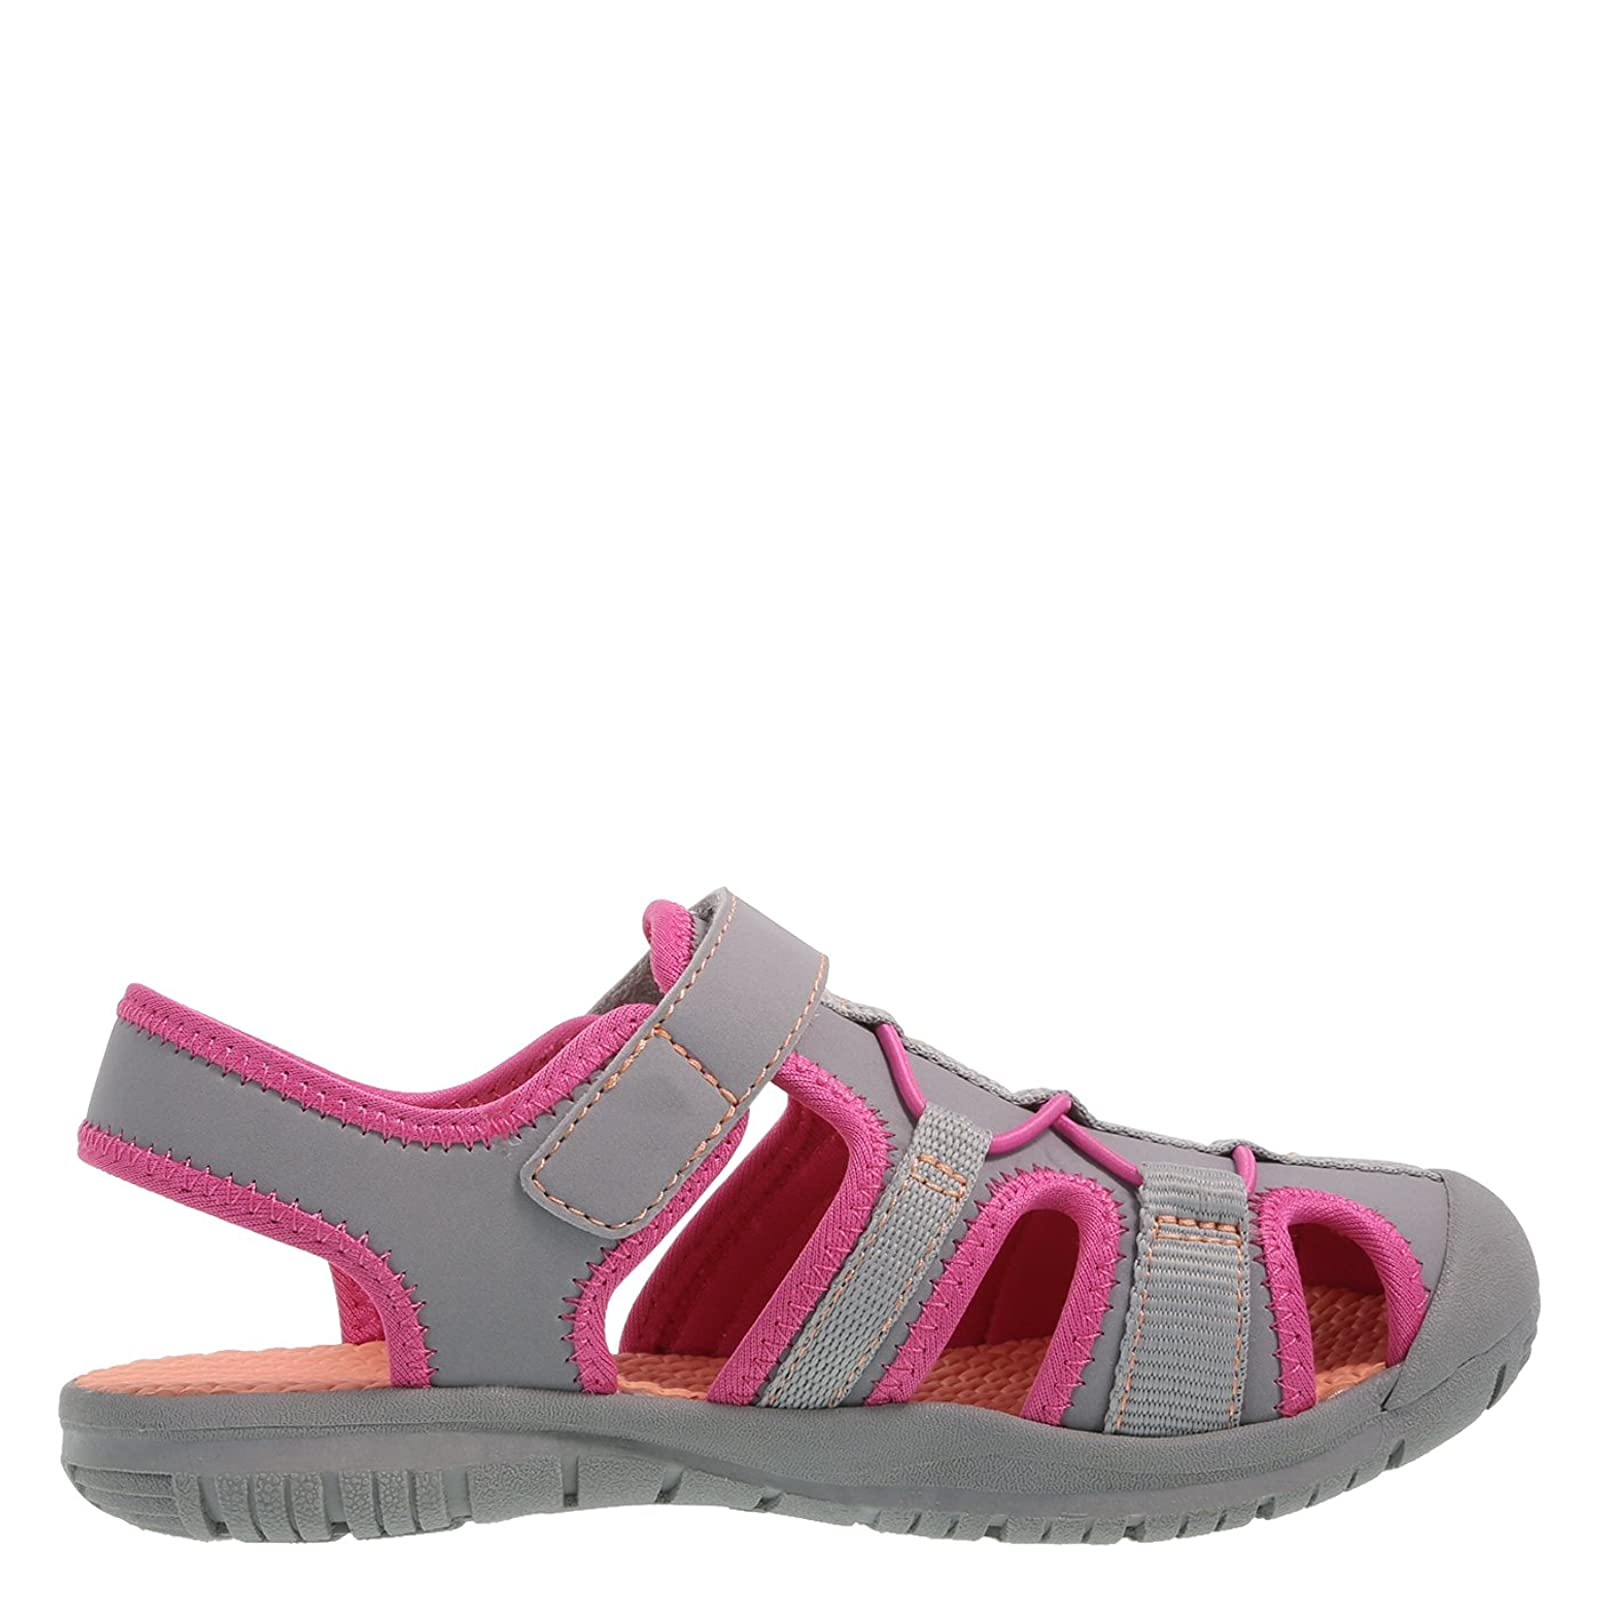 Rugged Outback Grey Pink Girls' Marina Bumptoe 175191040 - 1